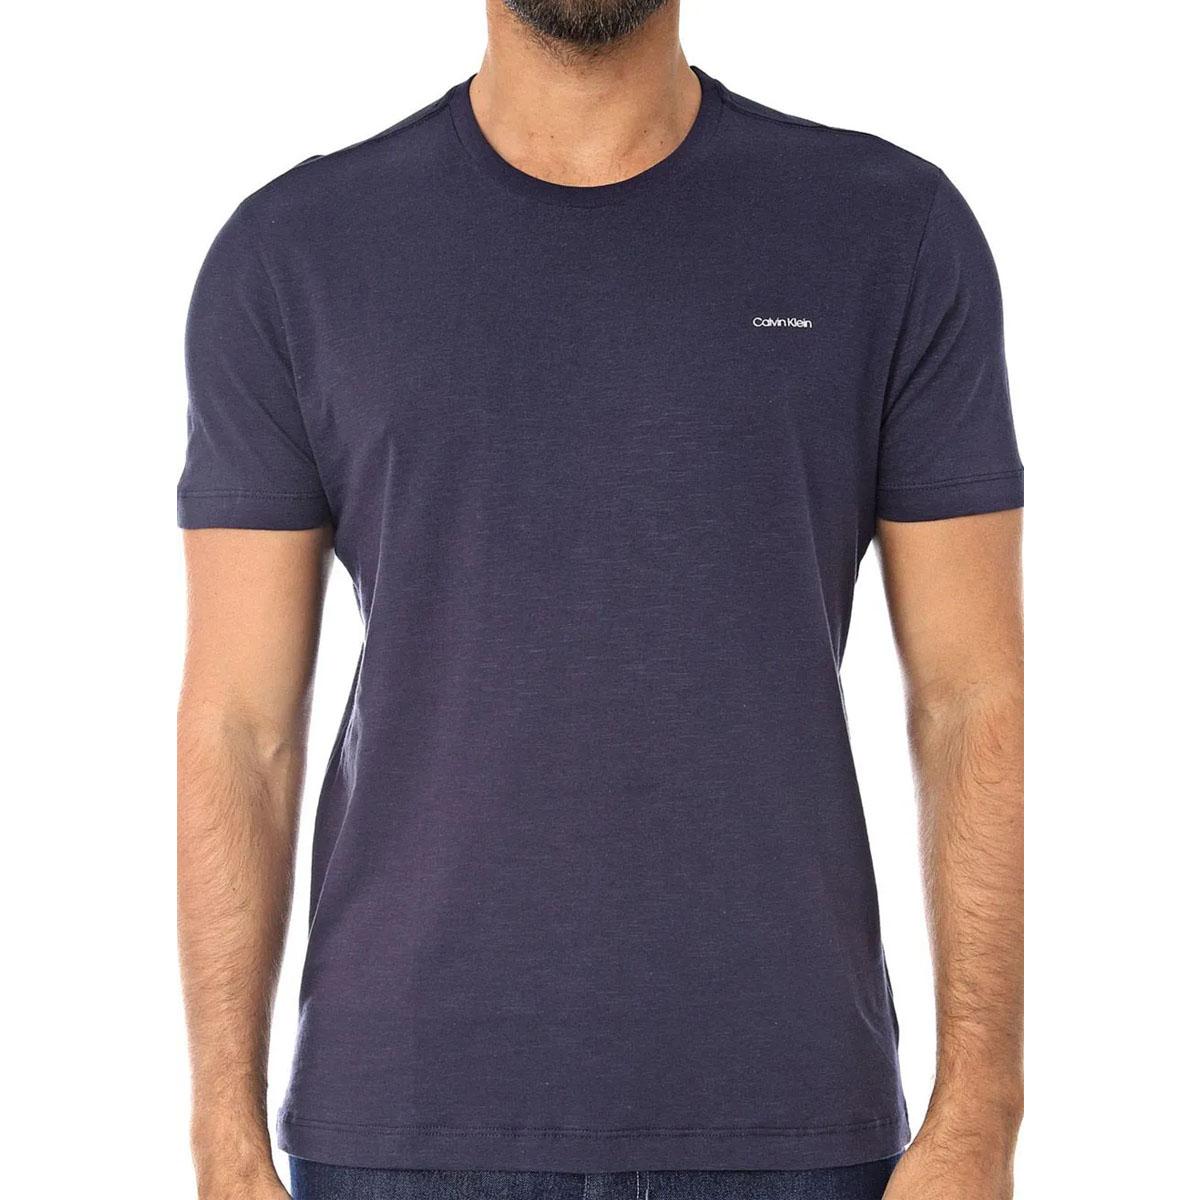 Camiseta Calvin Klein Masculina Flame Indigo